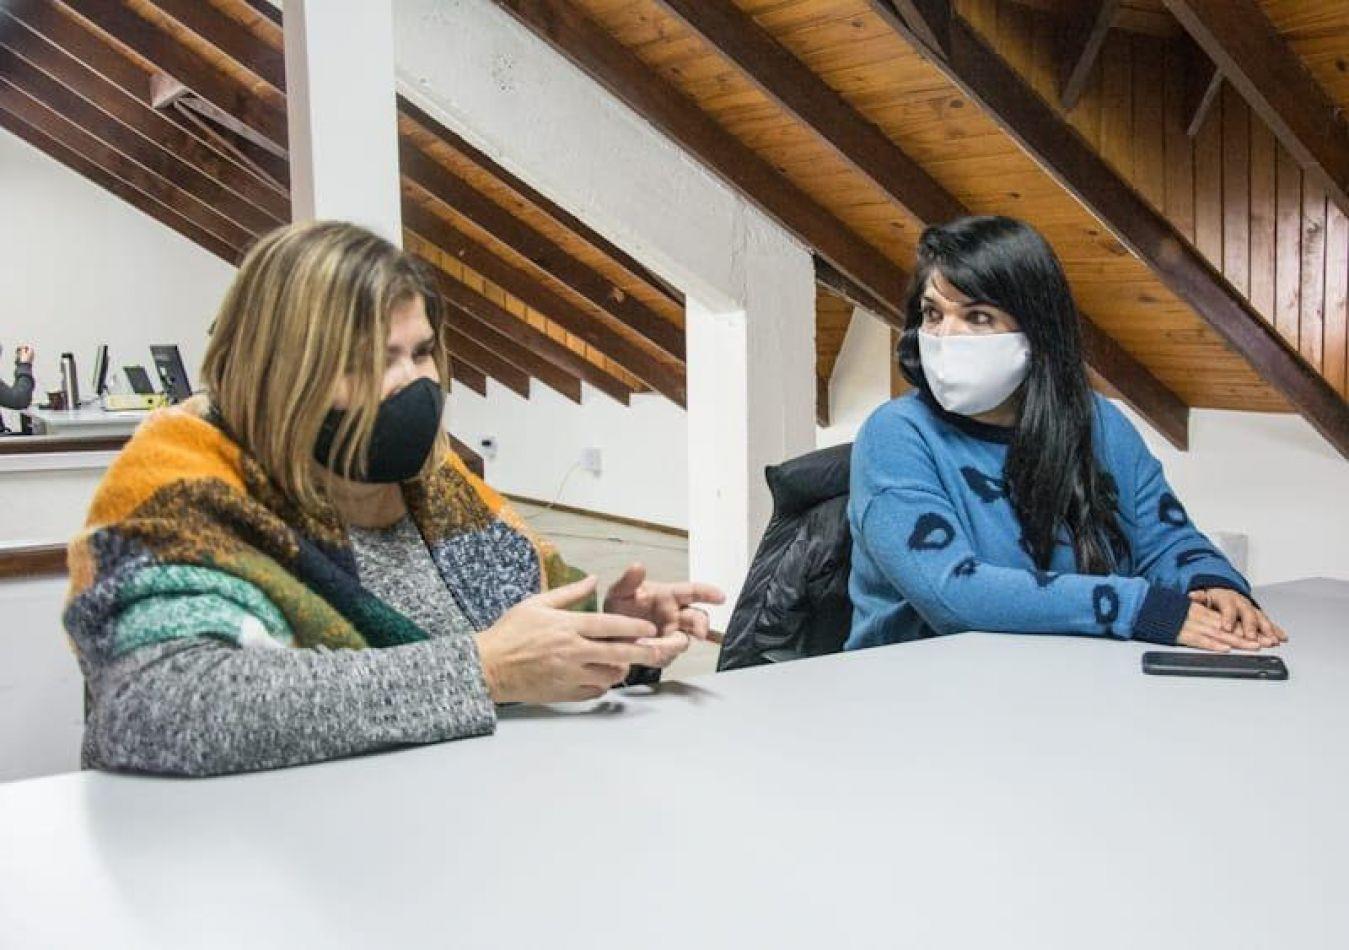 Municipio de Ushuaia trabaja articuladamente con la Senadora Duré